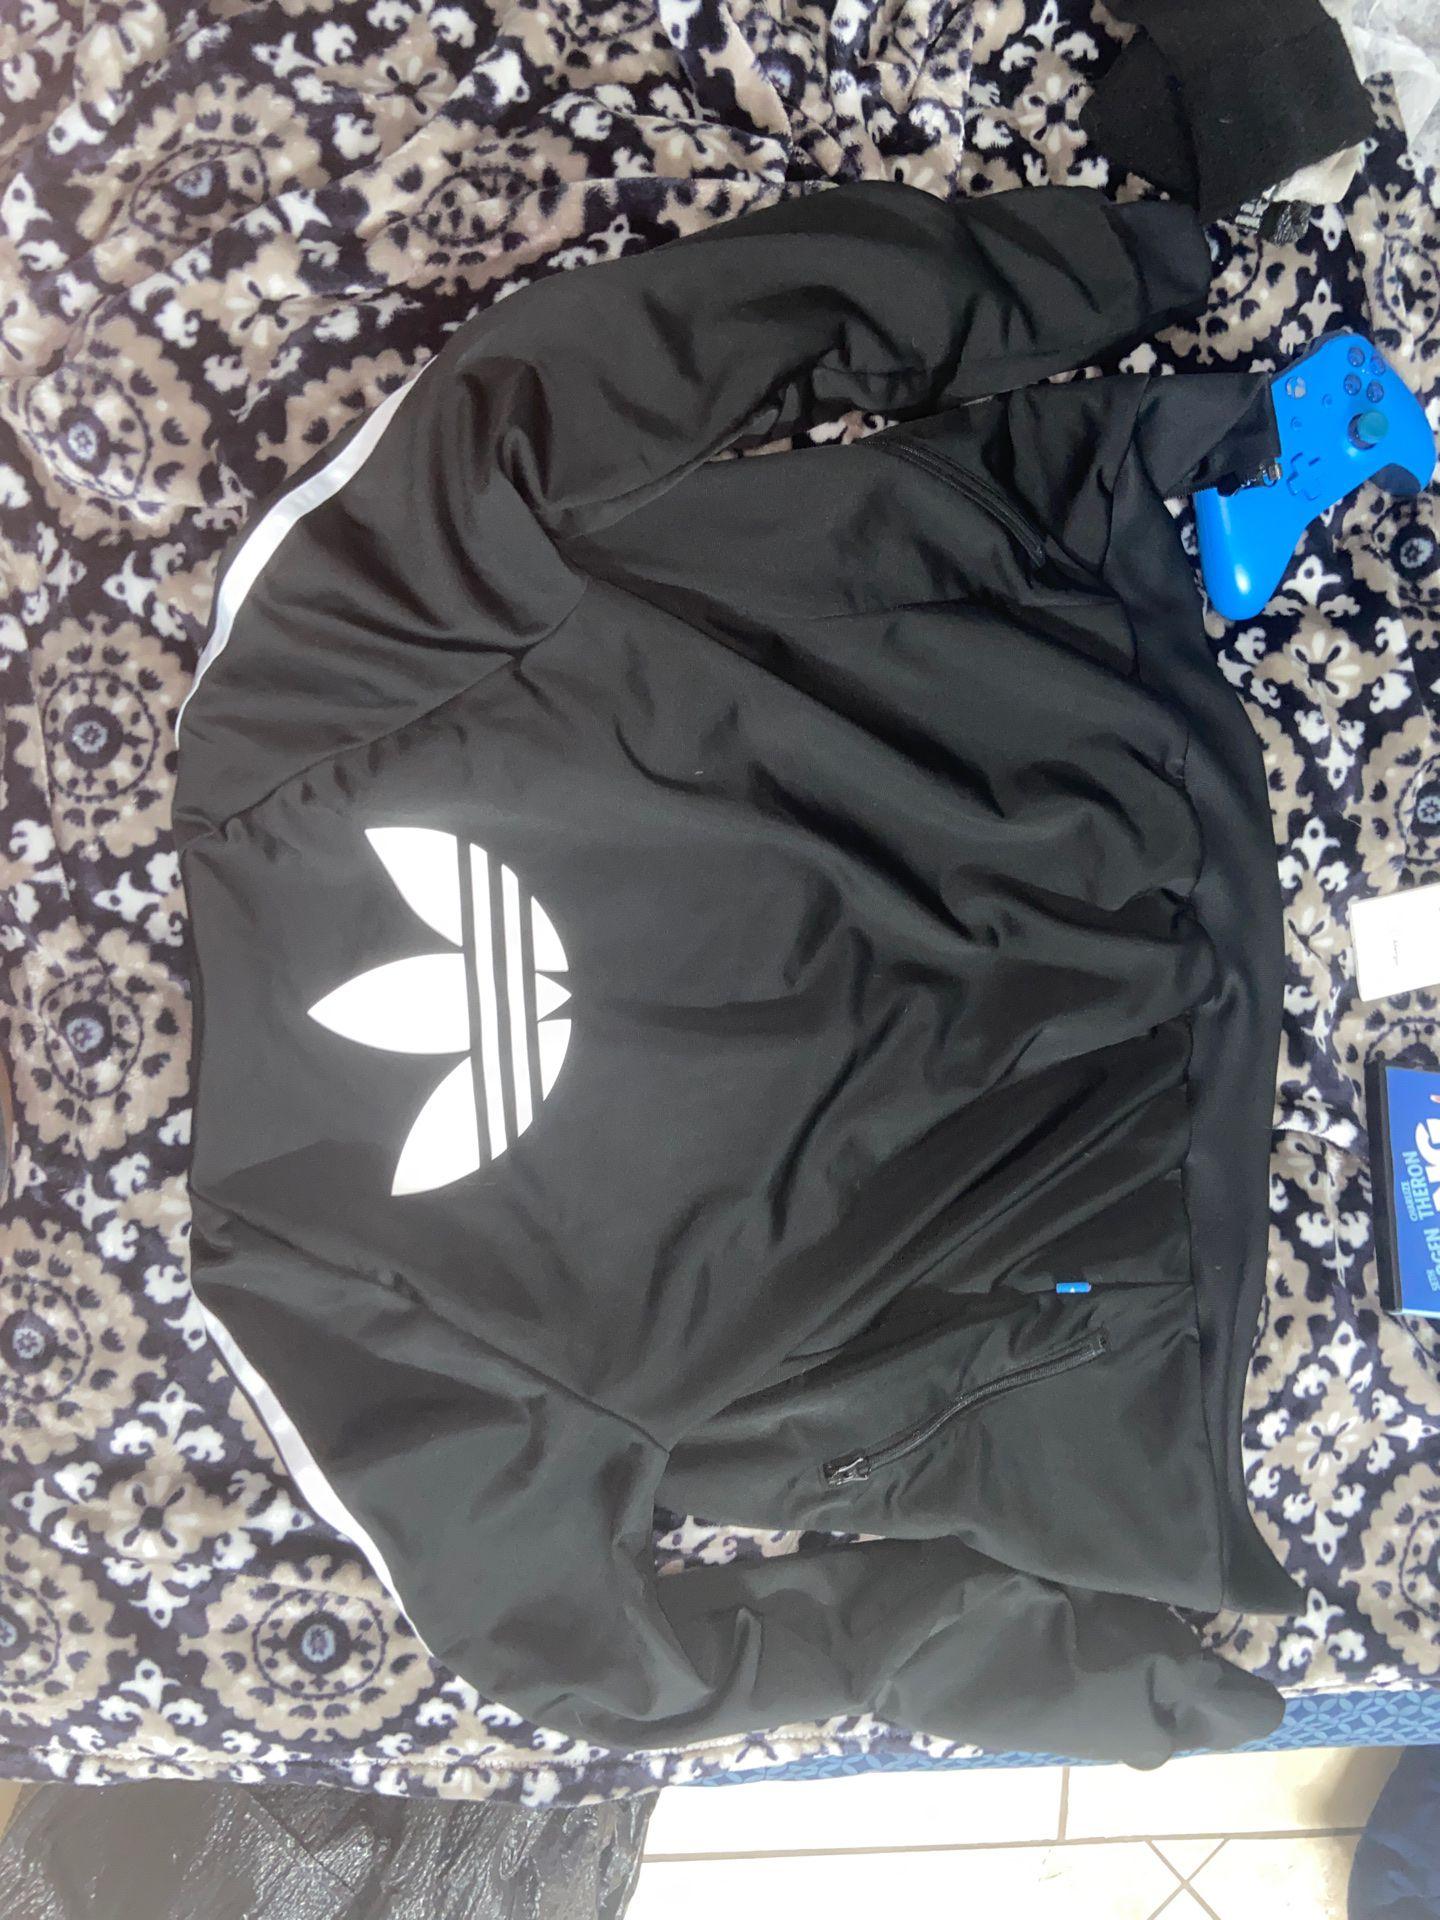 Real Adidas jacket never used